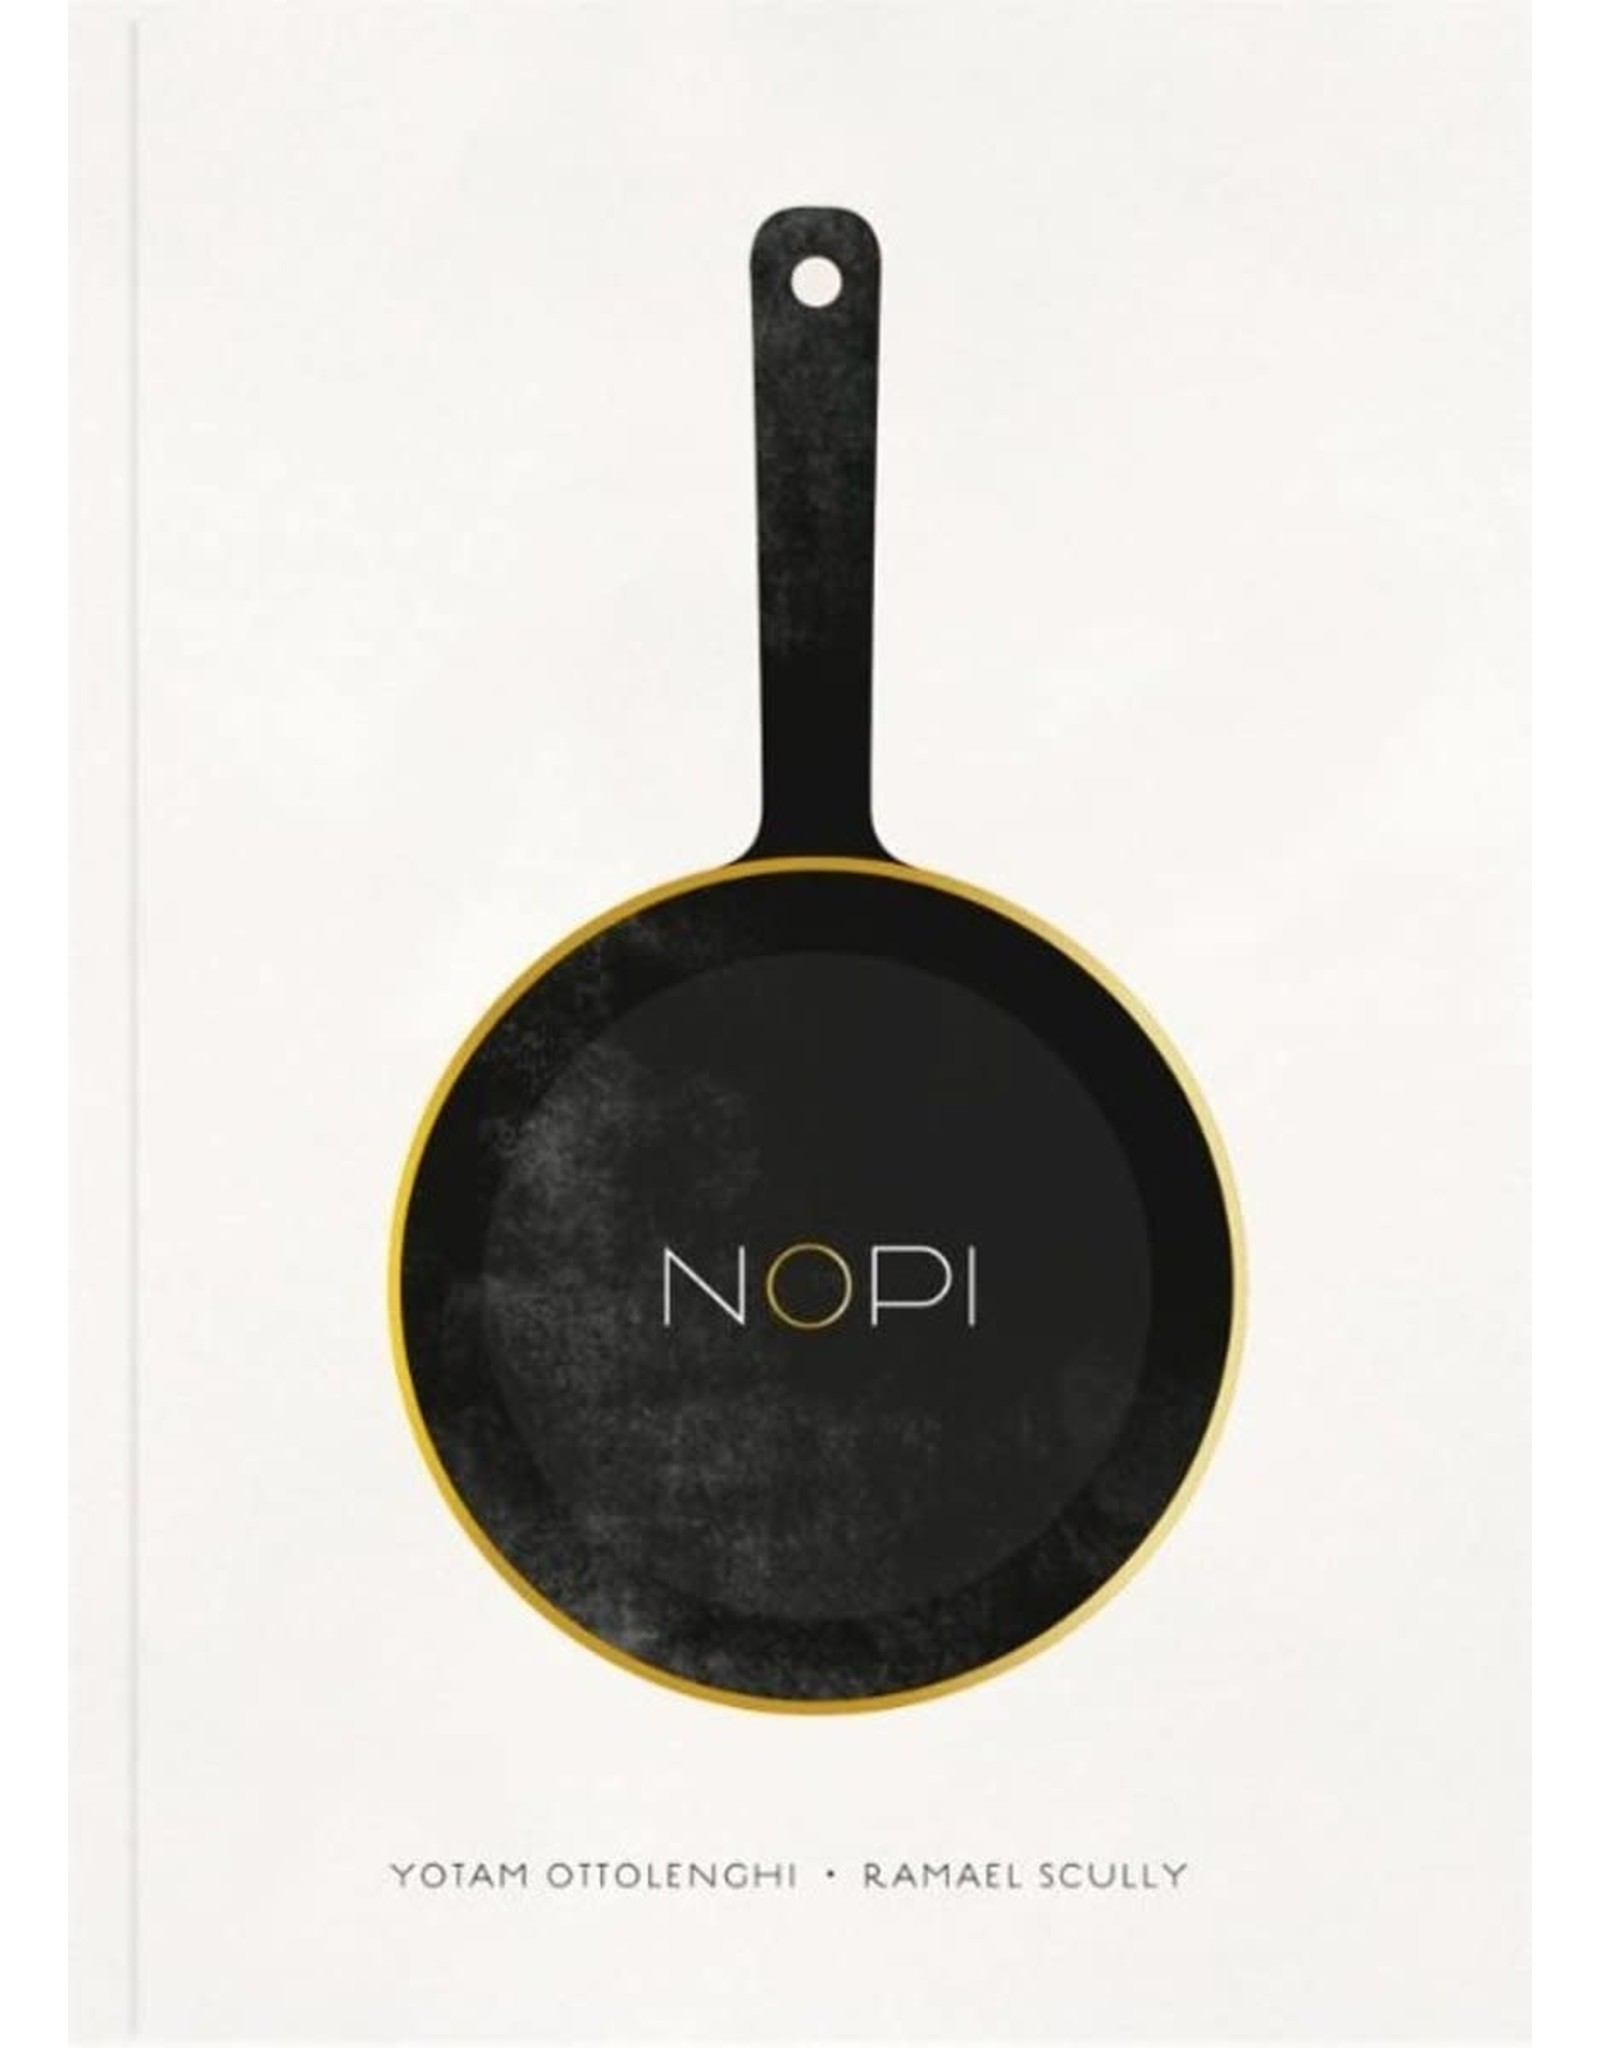 Ottolenghi/Scully - NOPI